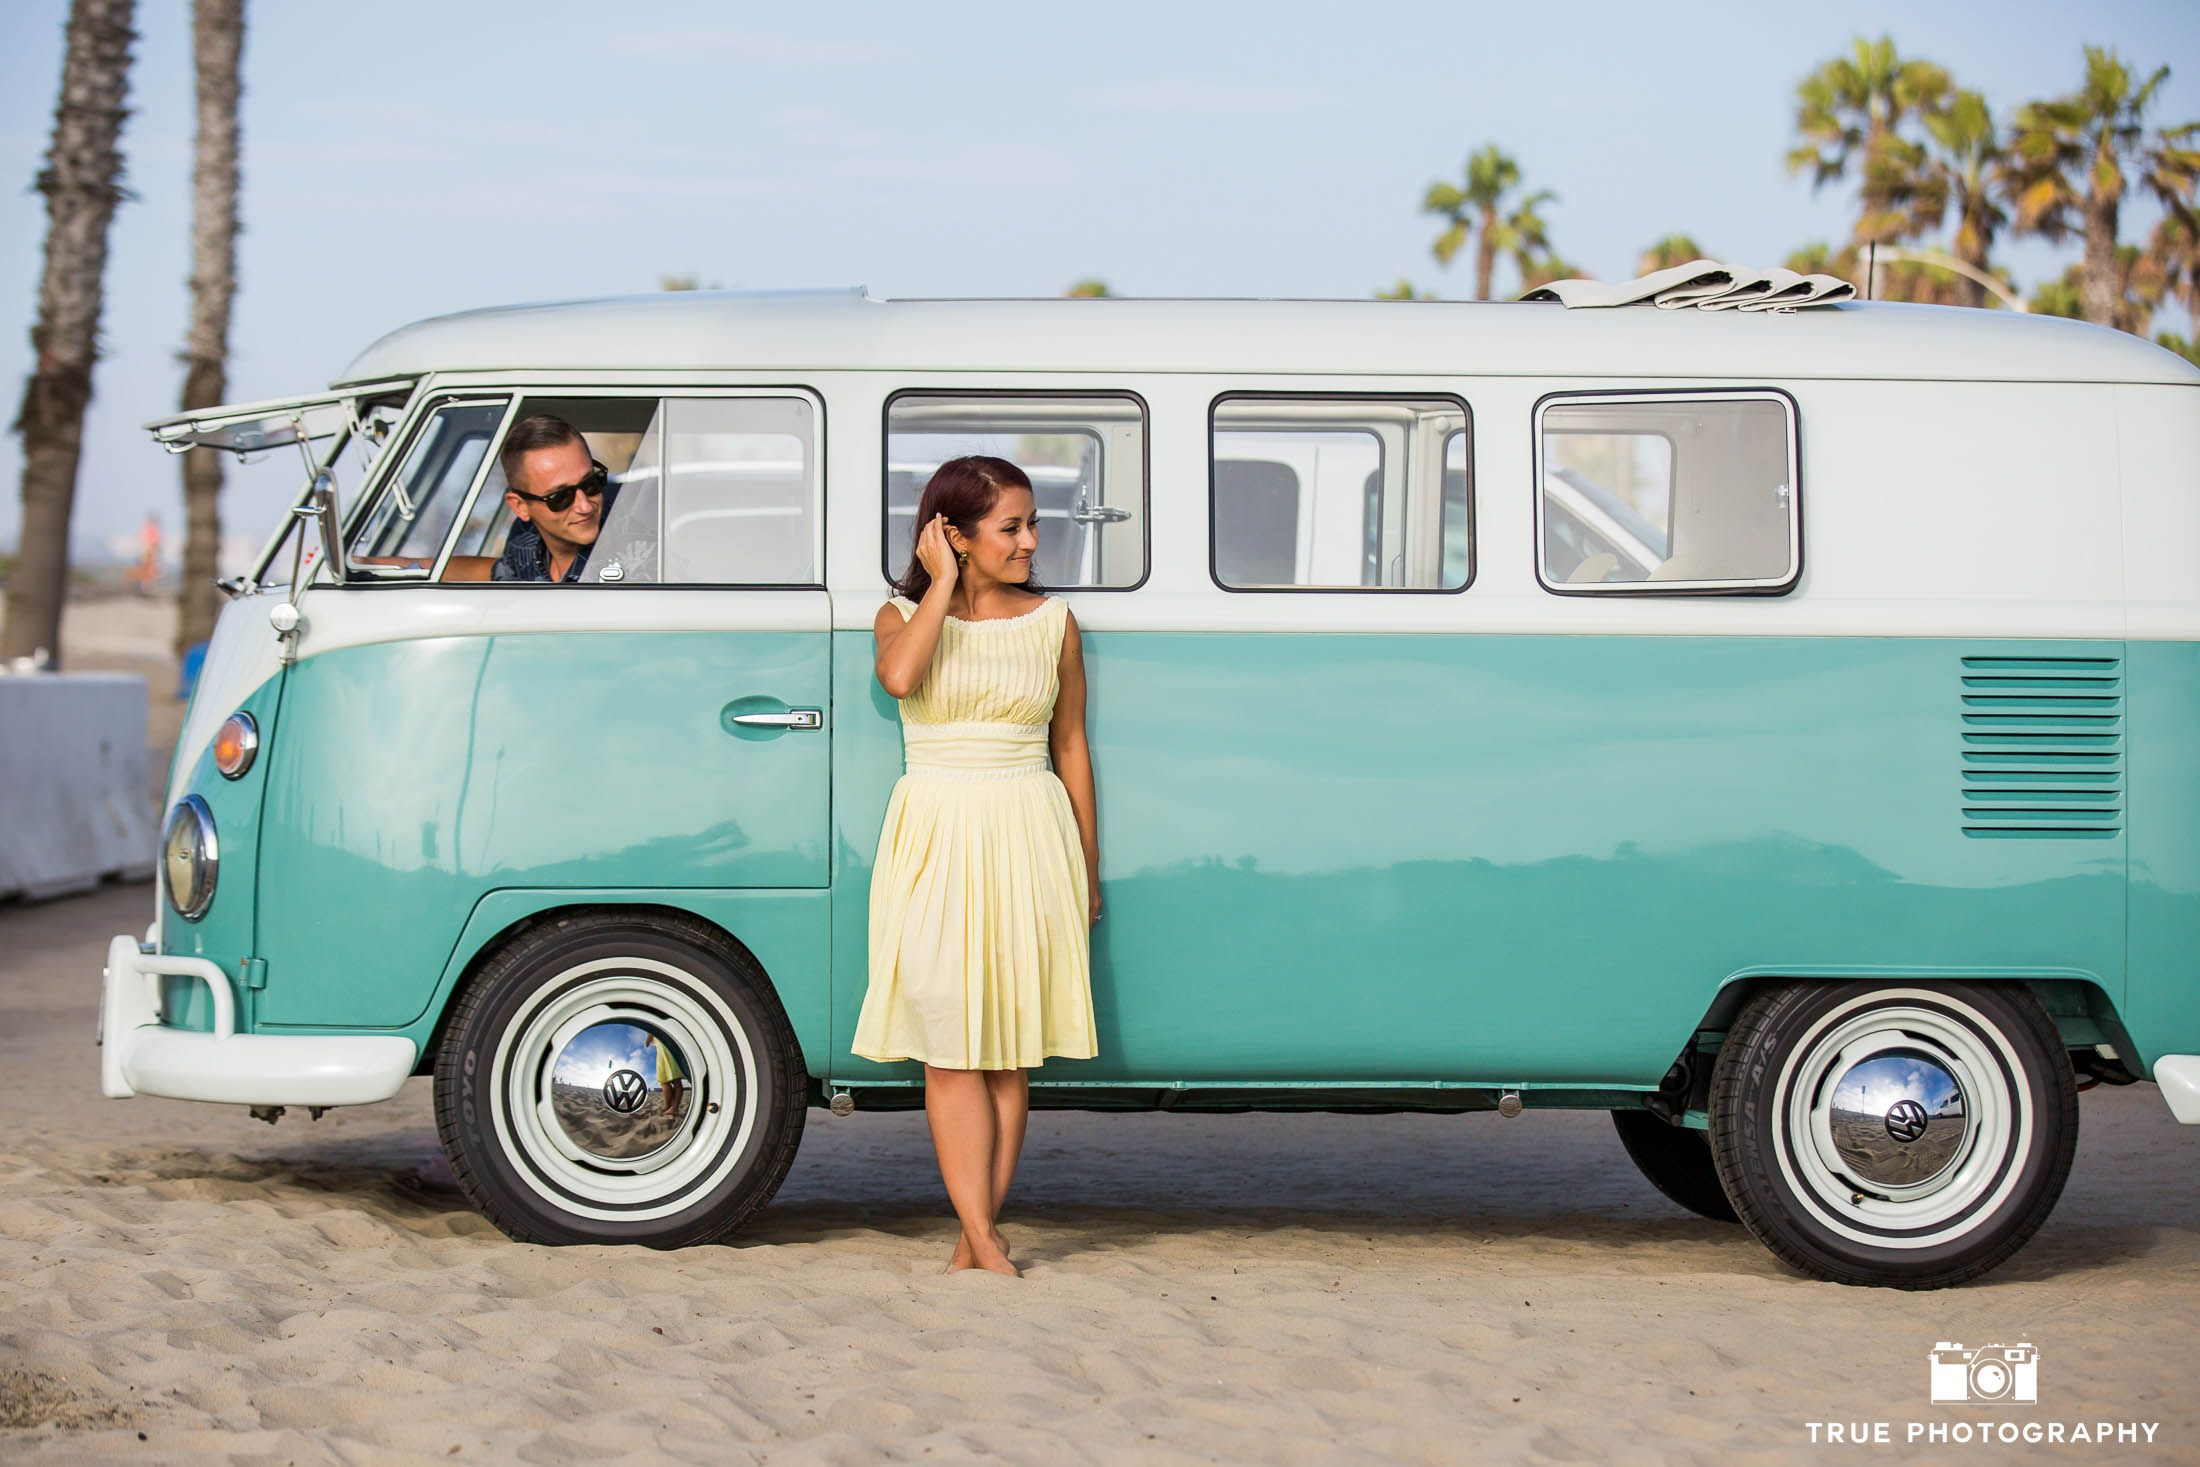 bride to be stands outside vintage volkswagen bus while. Black Bedroom Furniture Sets. Home Design Ideas